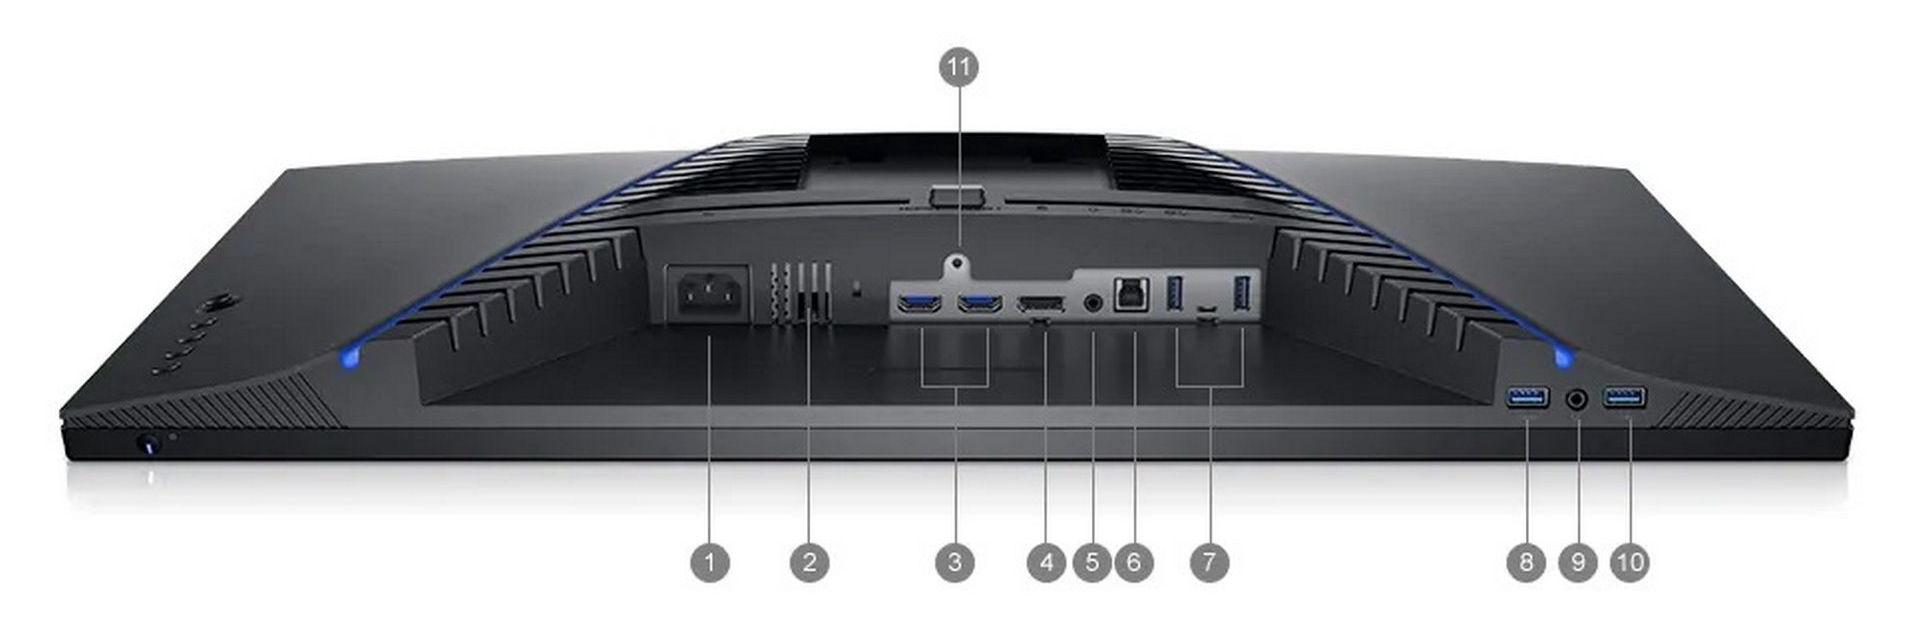 Màn Hình Dell S2721DGF Cổng & Khe cắm